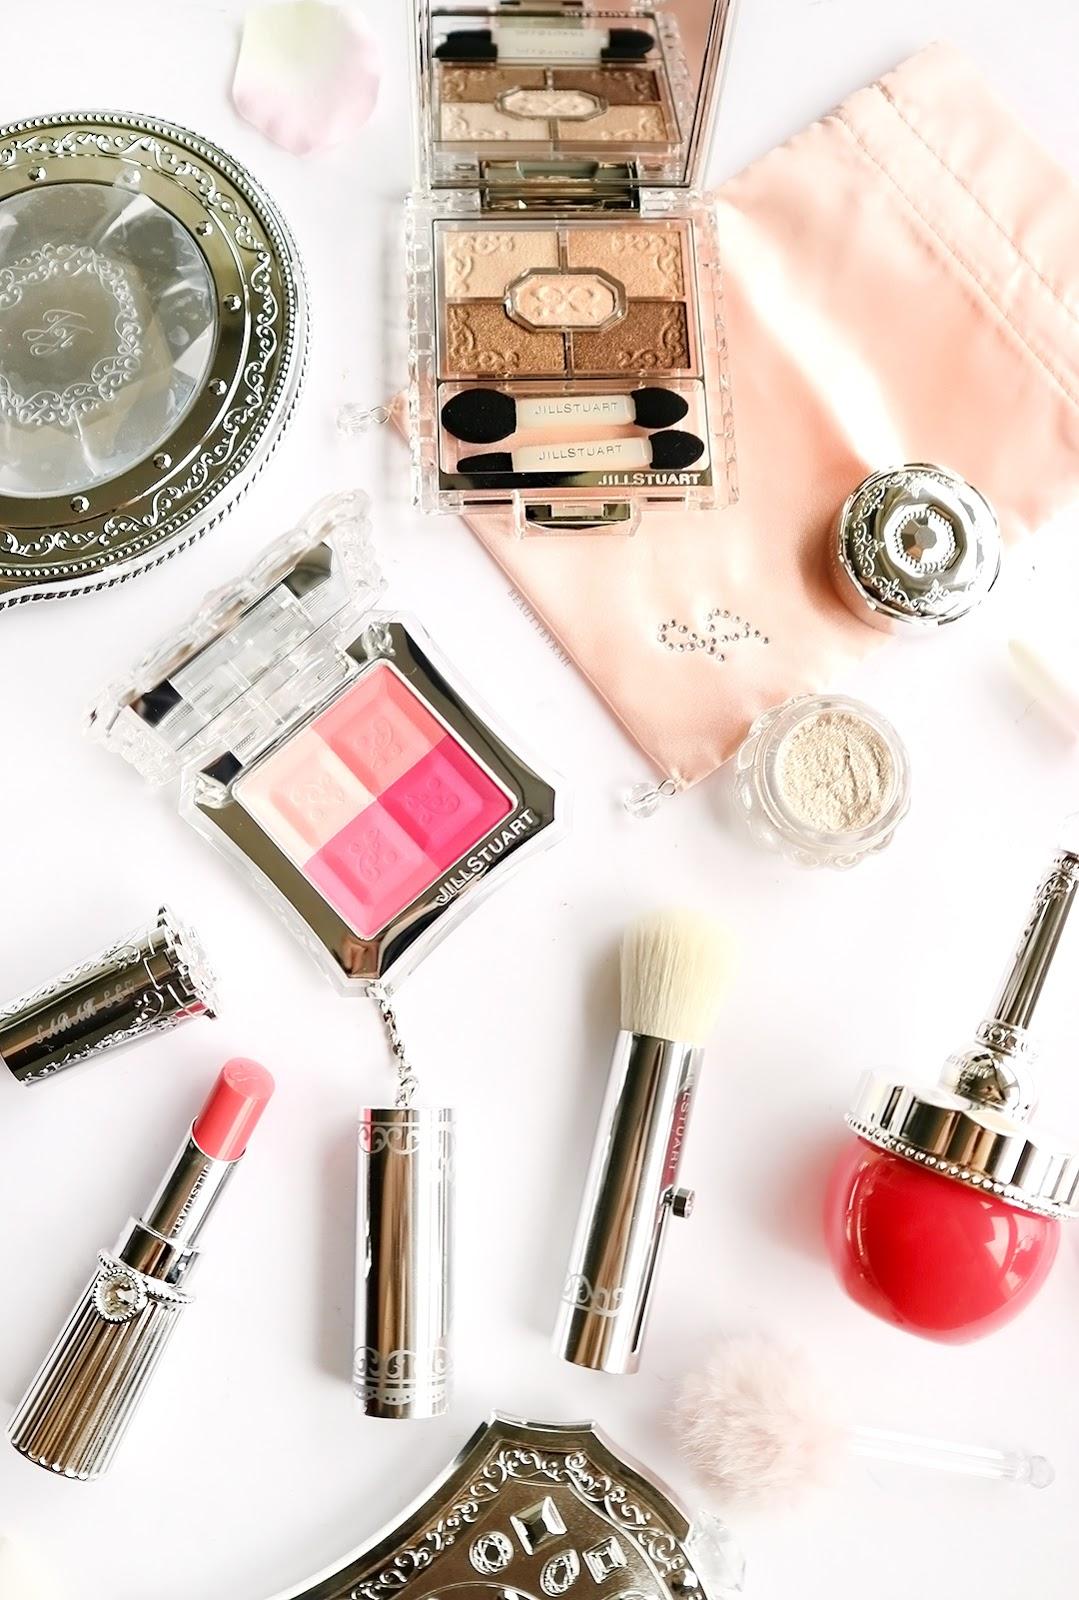 Jill Stuart Beauty Singapore Review